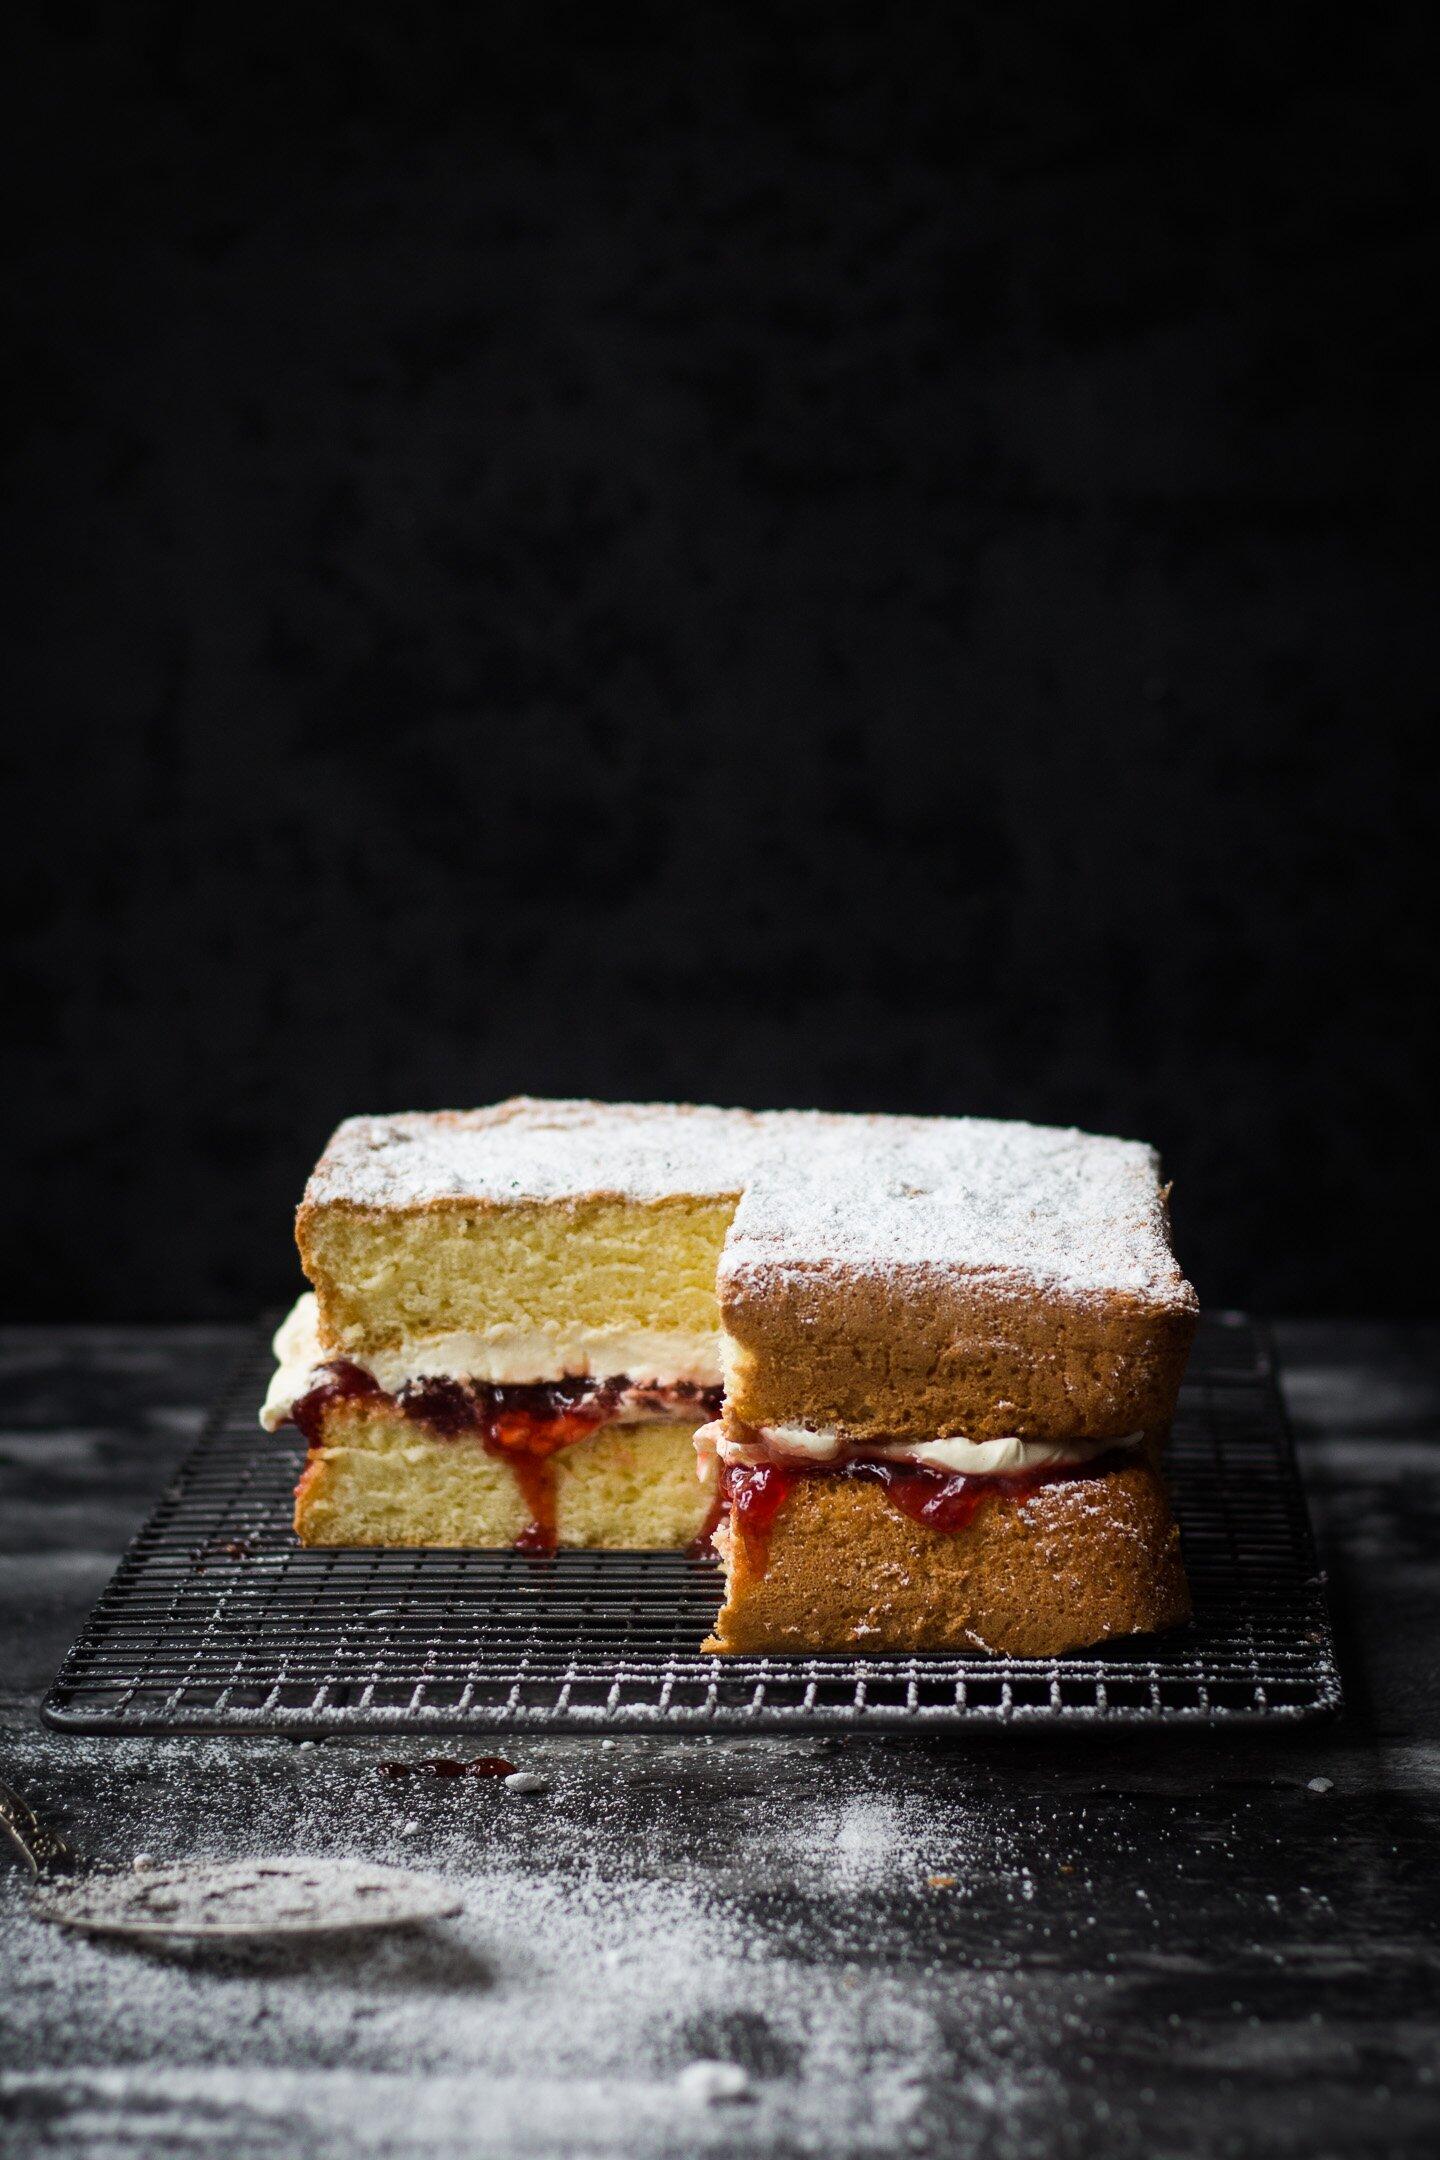 victorian-sponge-cake-gluten-free-recipe-3